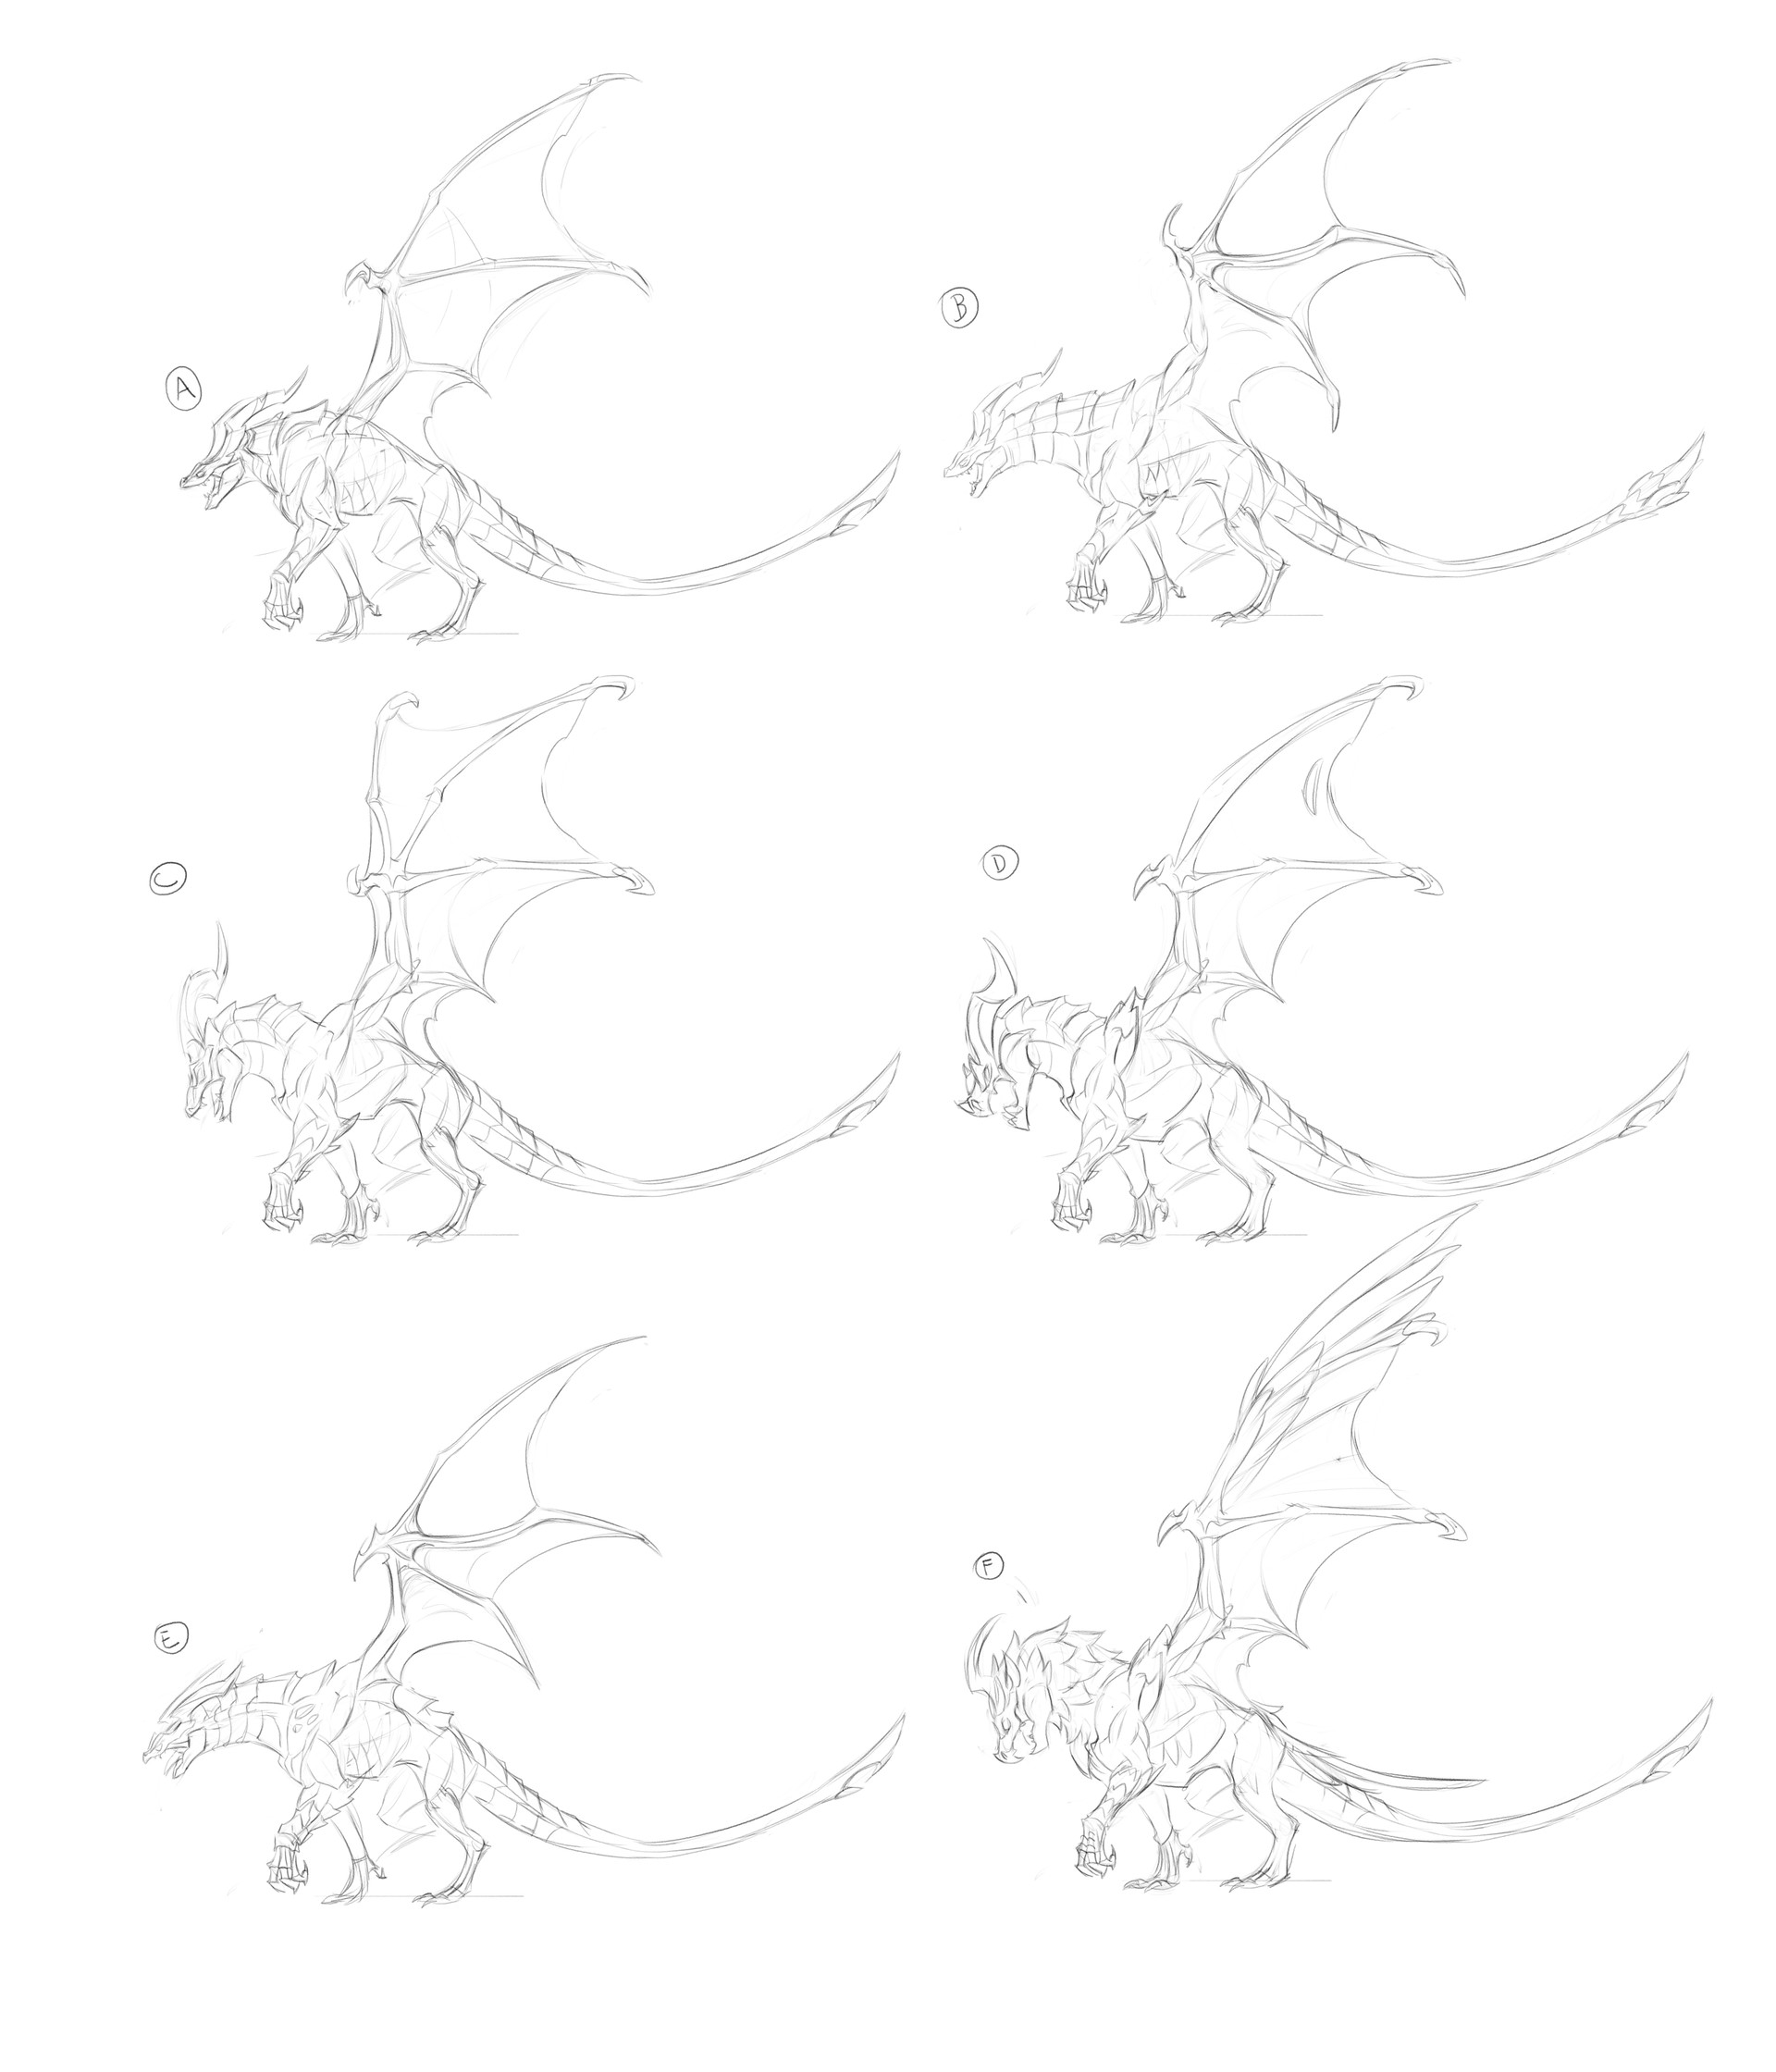 Joao henrique pacheco dragon sketch fab wip